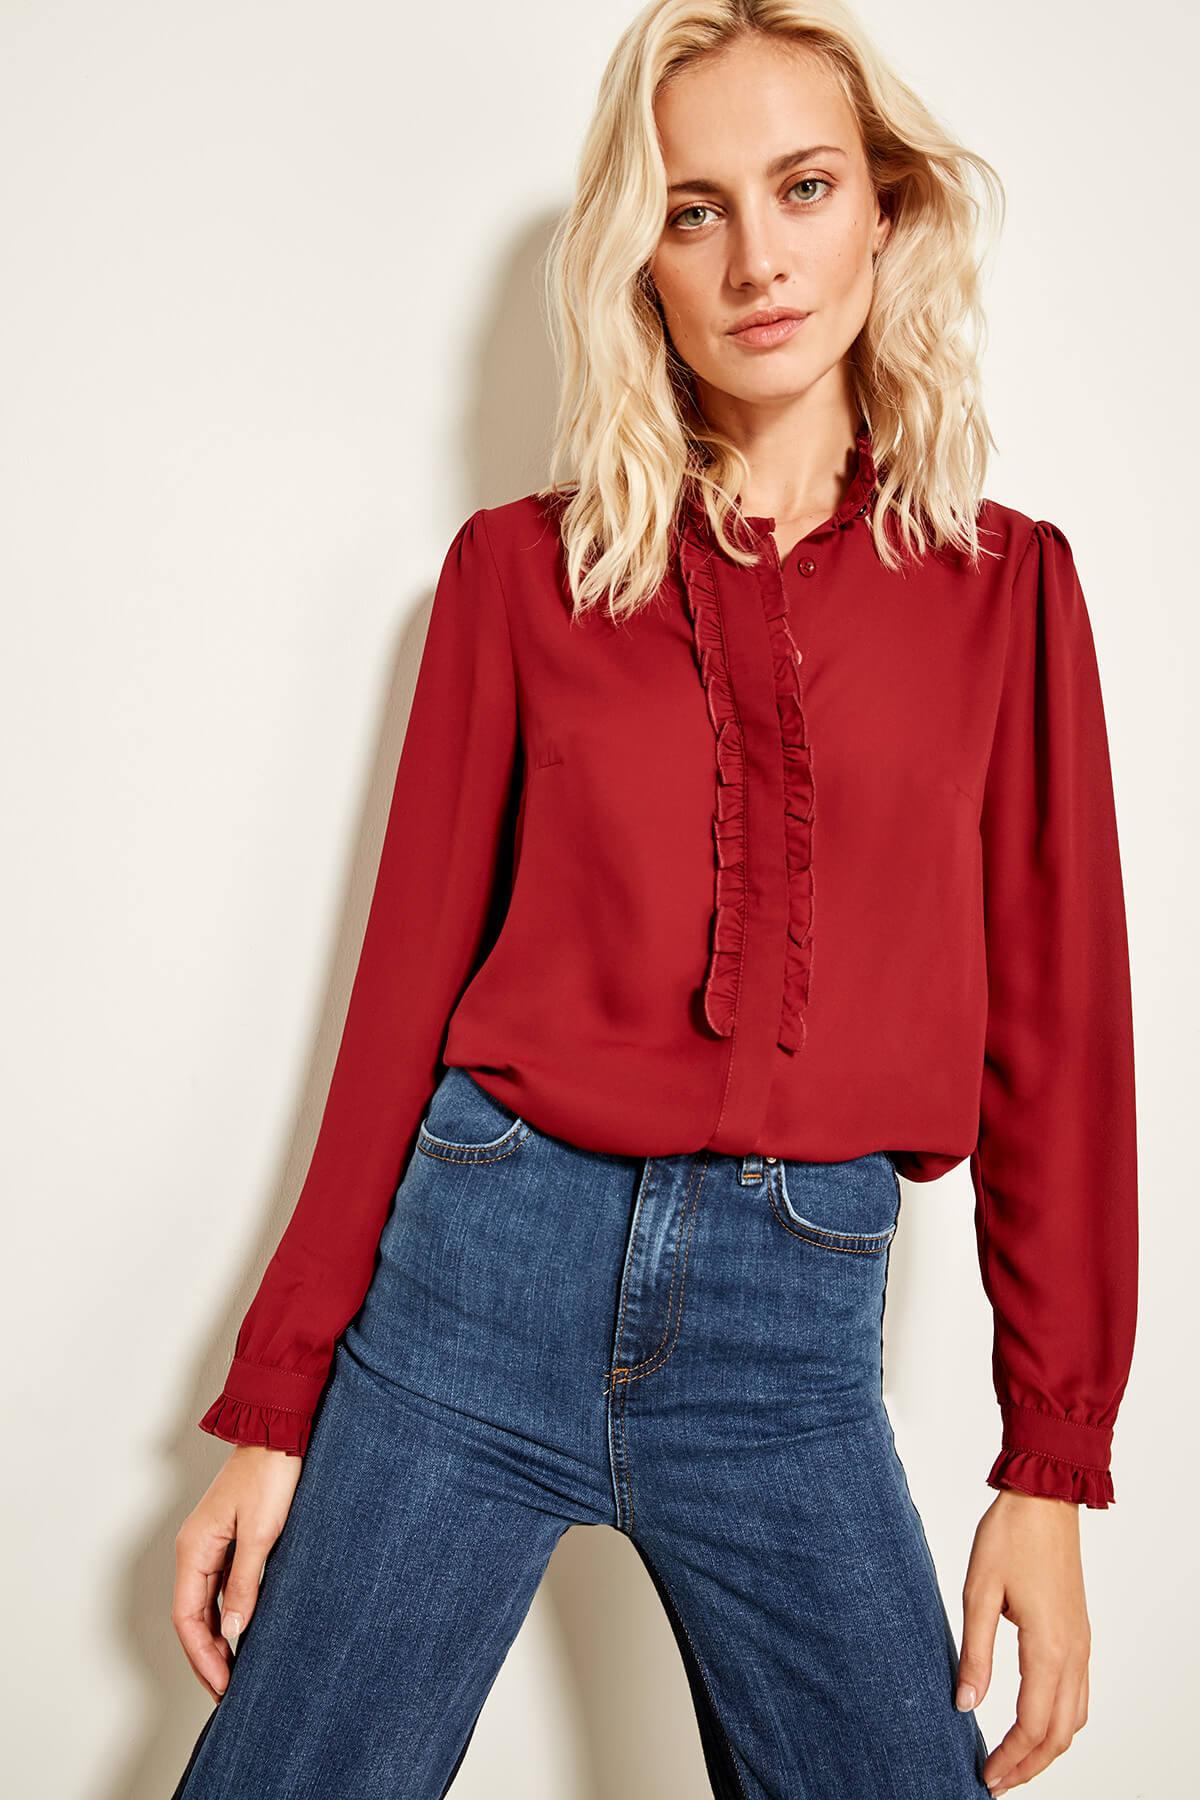 Trendyol Burgundy Ruffle Detailed Shirt